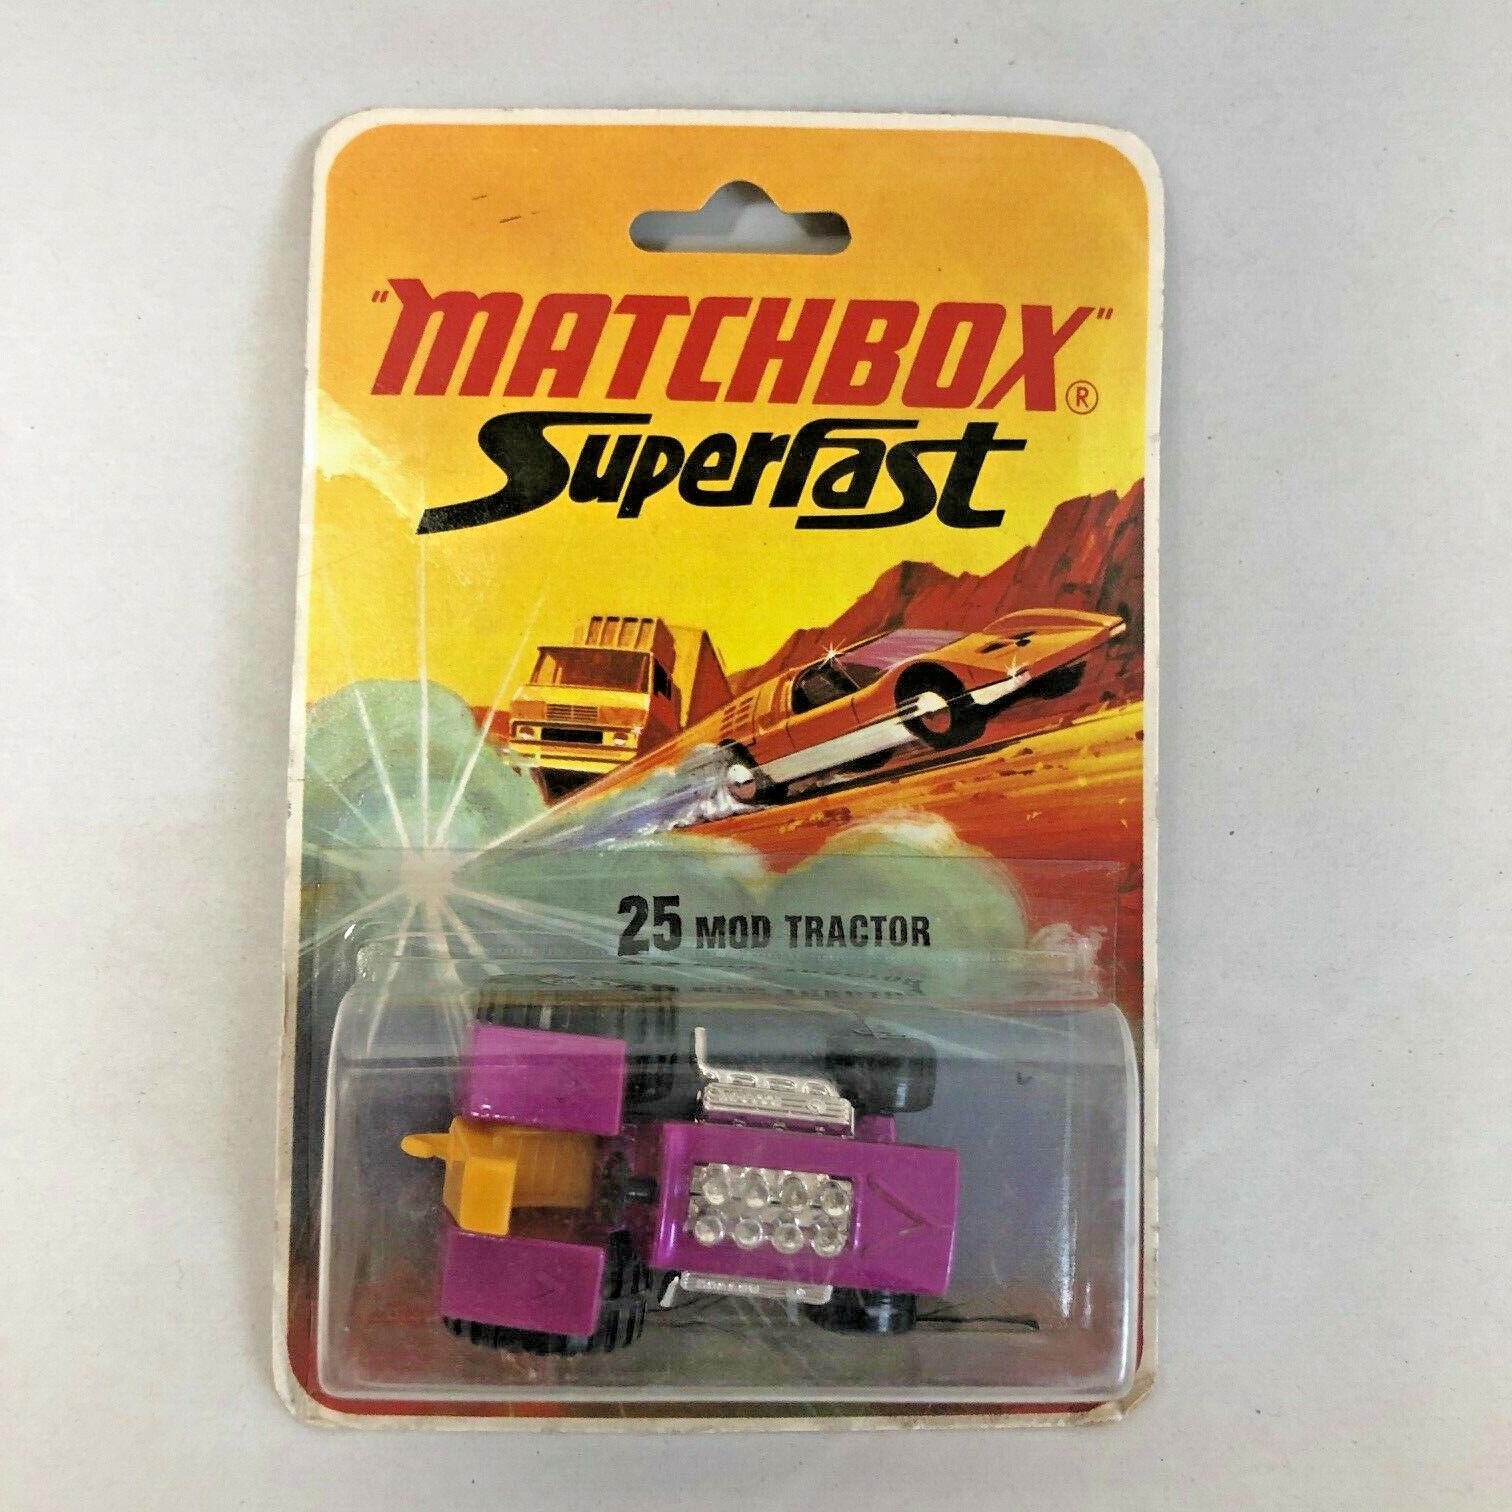 1972 Matchbox Superfast Mod Tractor MOC NOS